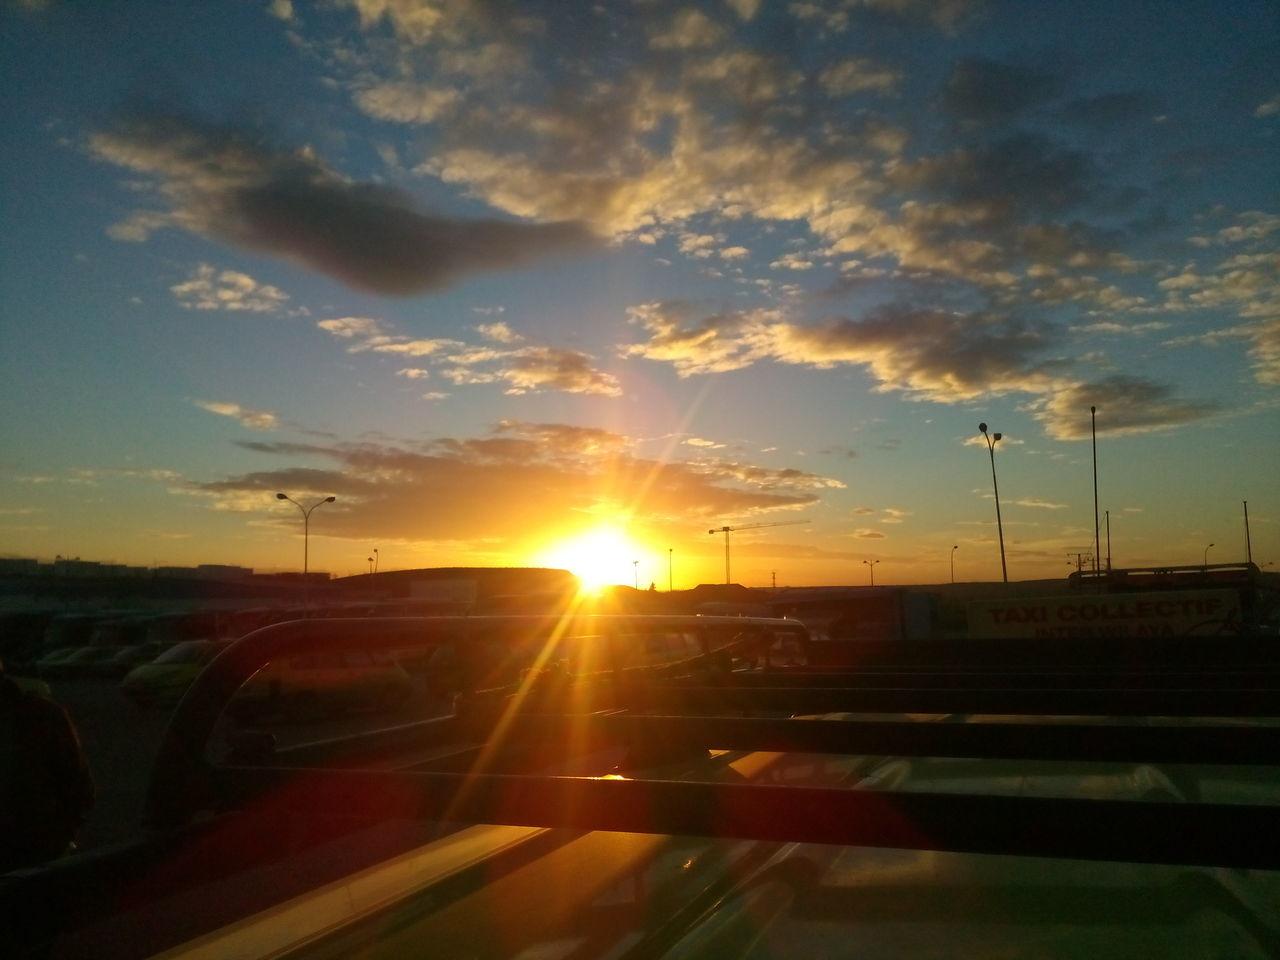 Going Home Light Spot Mode Of Transport No People Sky Shades Sunlight Sunset